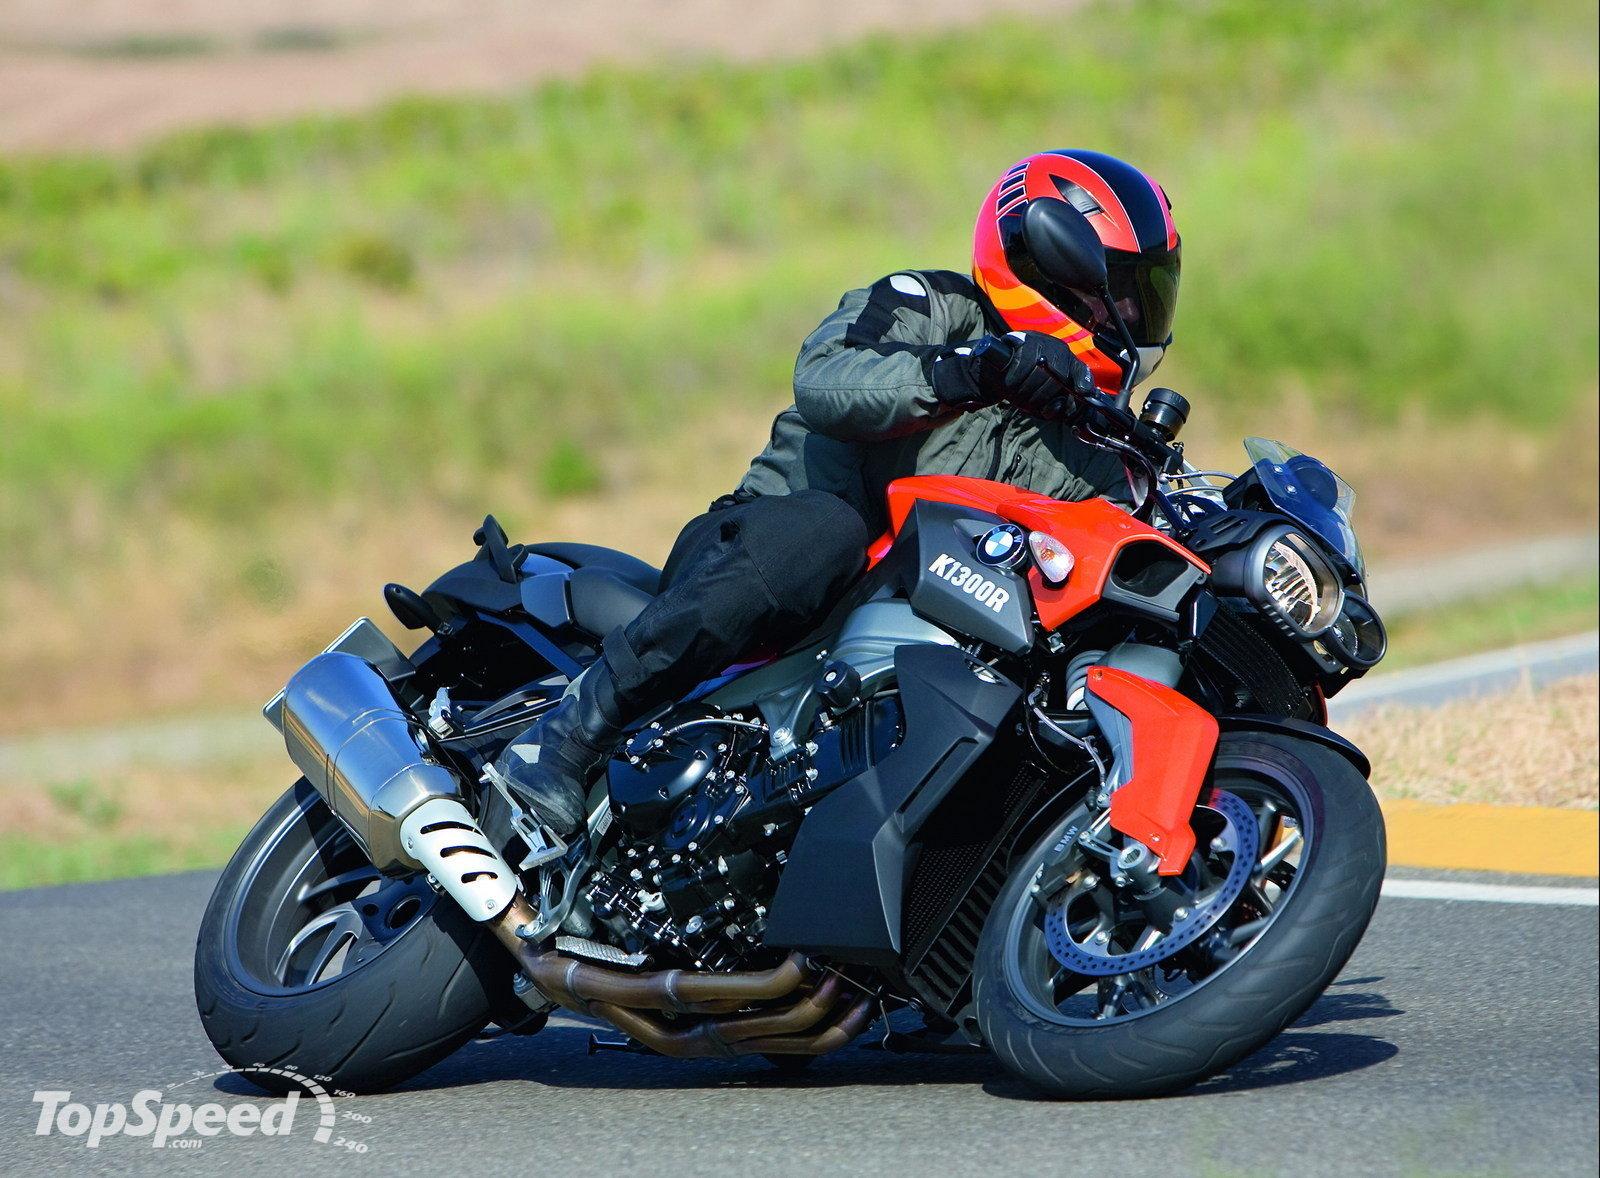 Bmw Heavy Bikes Prices Of Bmw Motorbikes In India